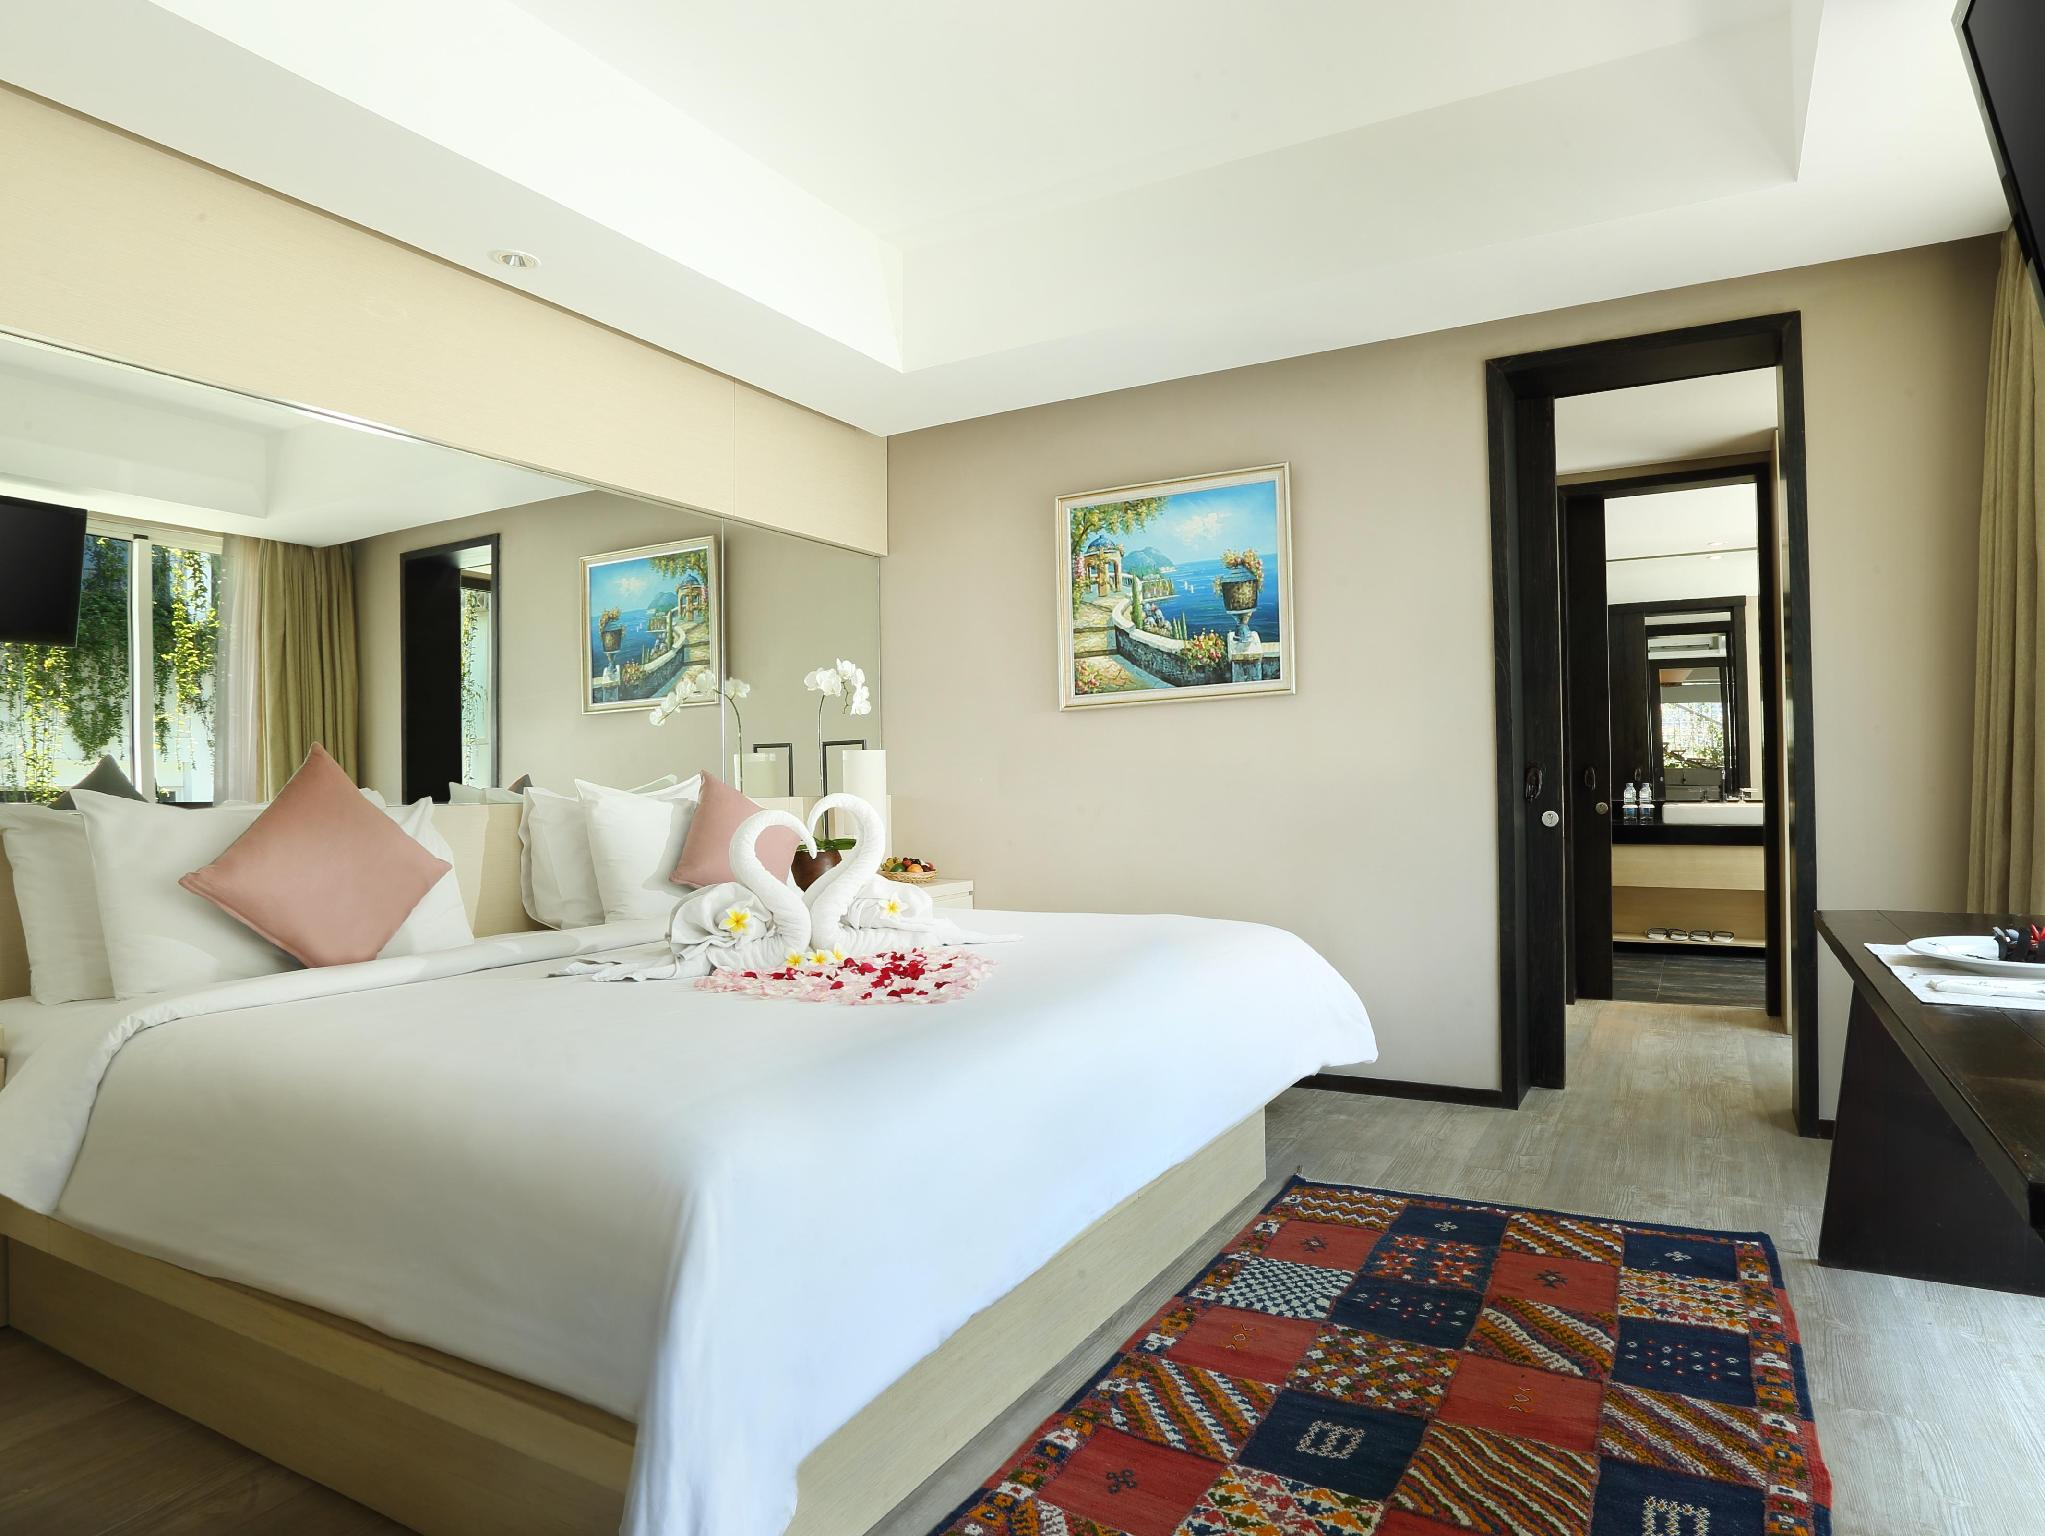 The akmani legian hotel, bali   boek een aanbieding op agoda.com